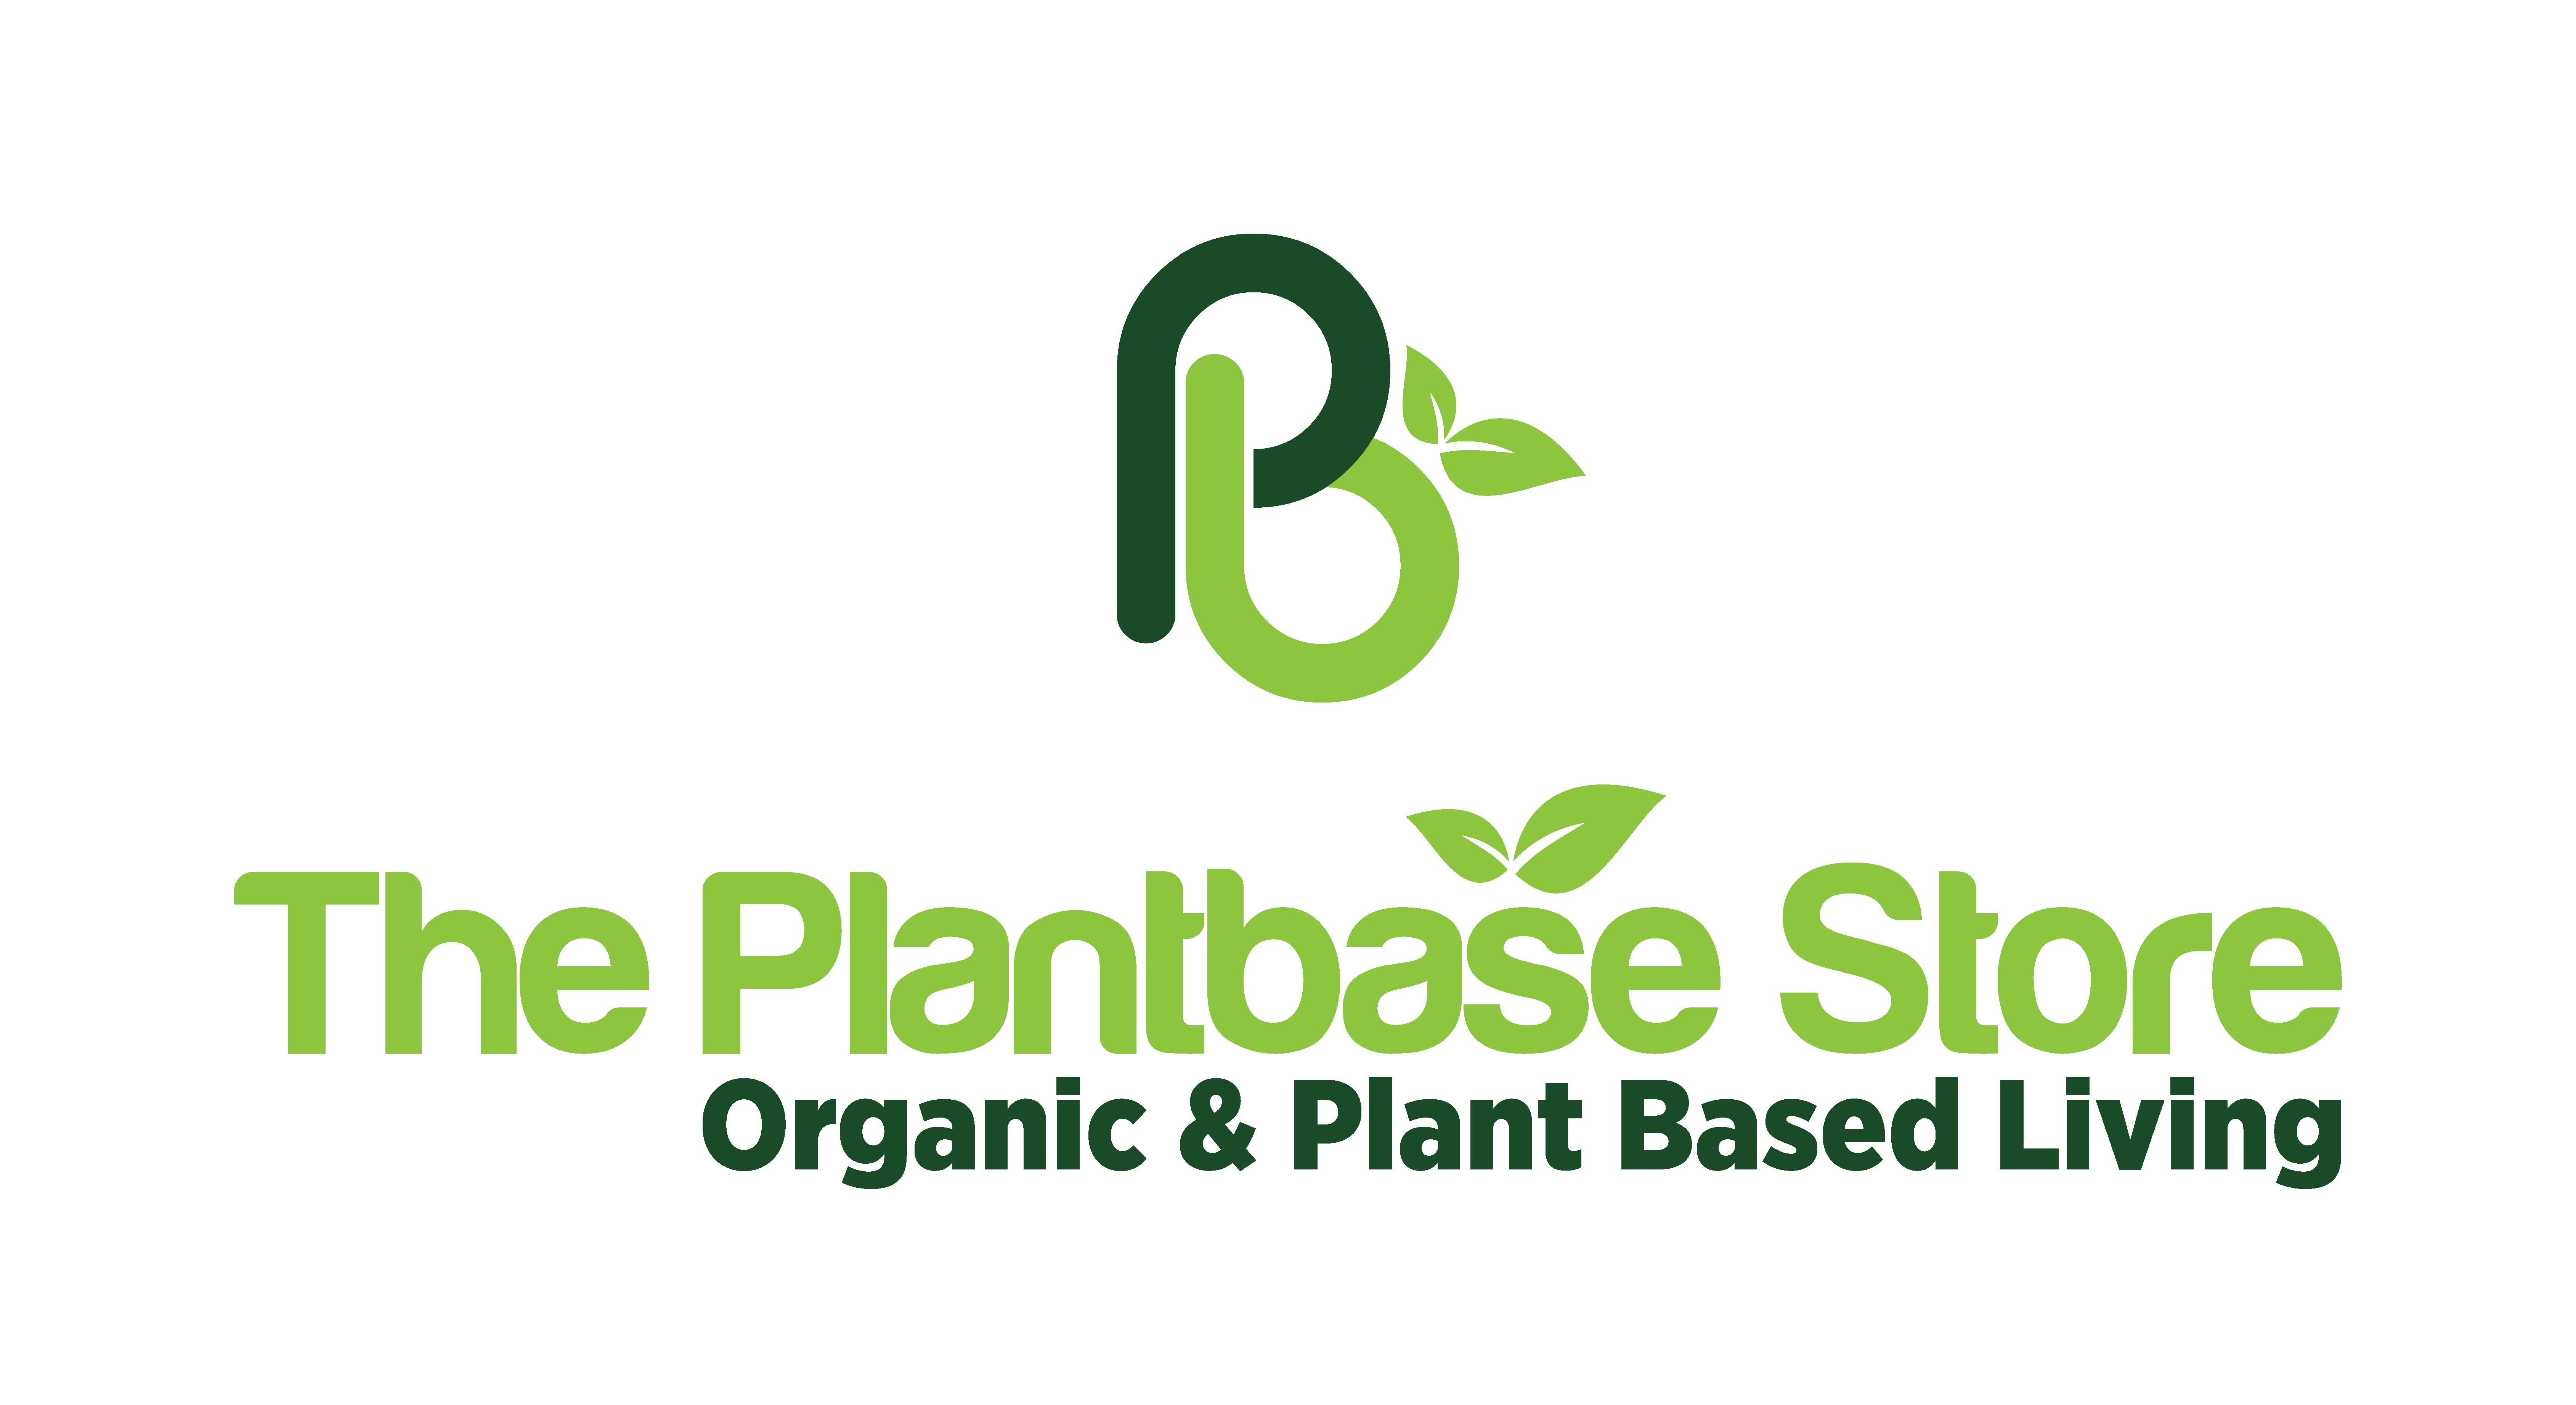 Longdan - The Plantbase Store